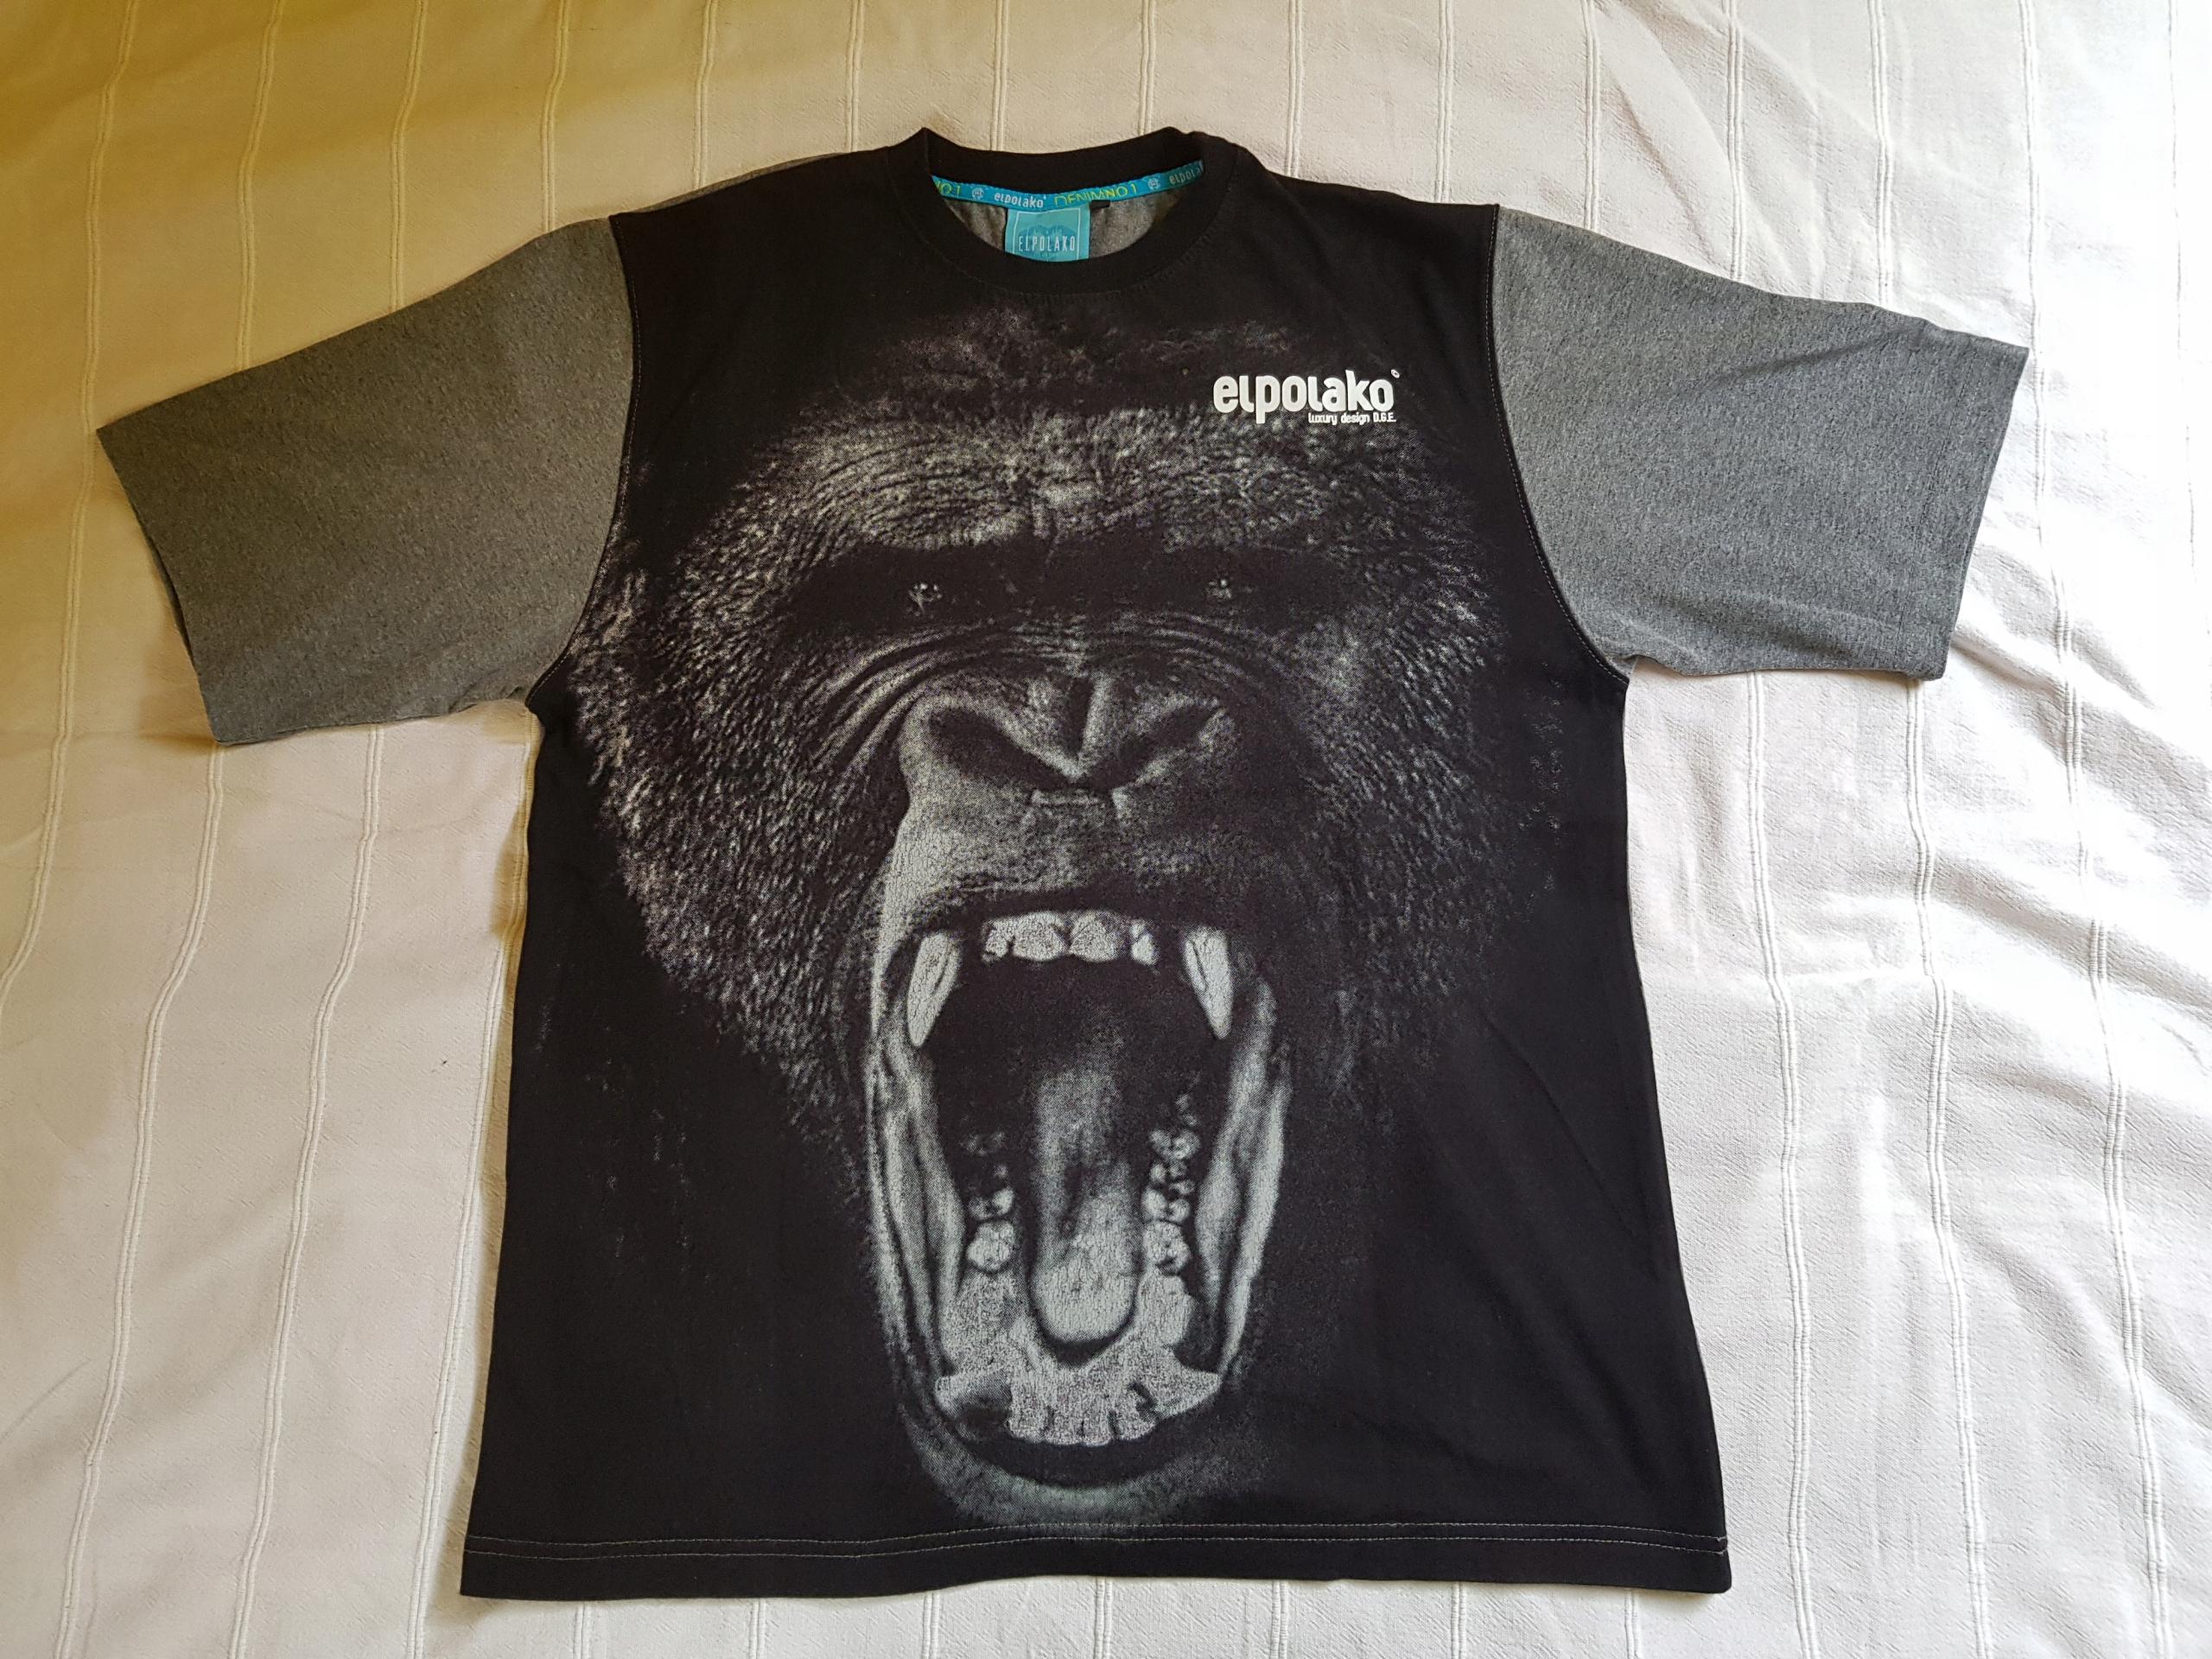 T-shirt koszulka El Polako GORYL